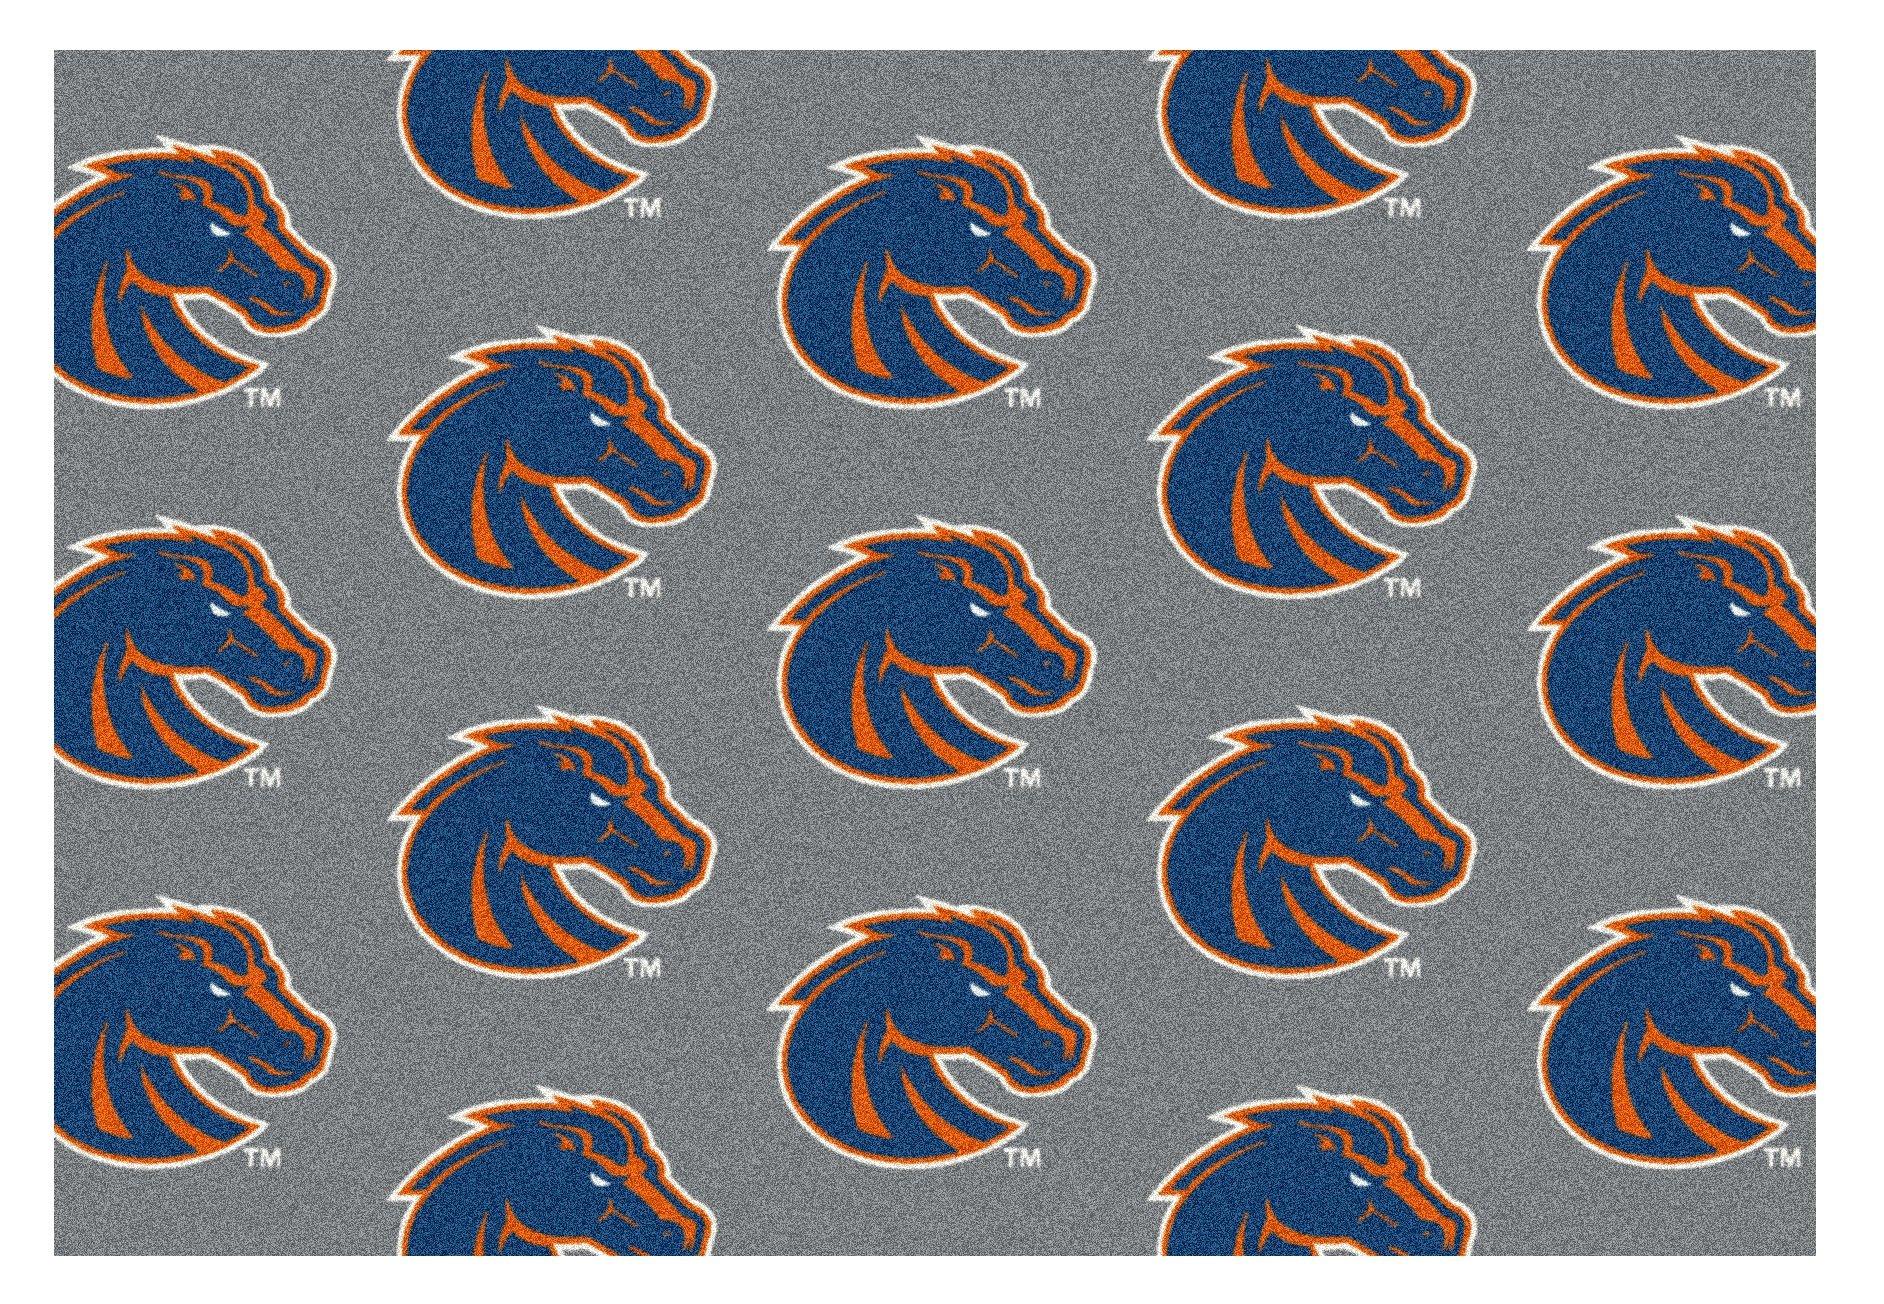 5'x8' BOISE STATE- Milliken NCAA College Sports Team Repeat Logo 100% Nylon Pile Fiber Broadloom Custom Area Rug Carpet with Premium Bound Edges by Koeckritz